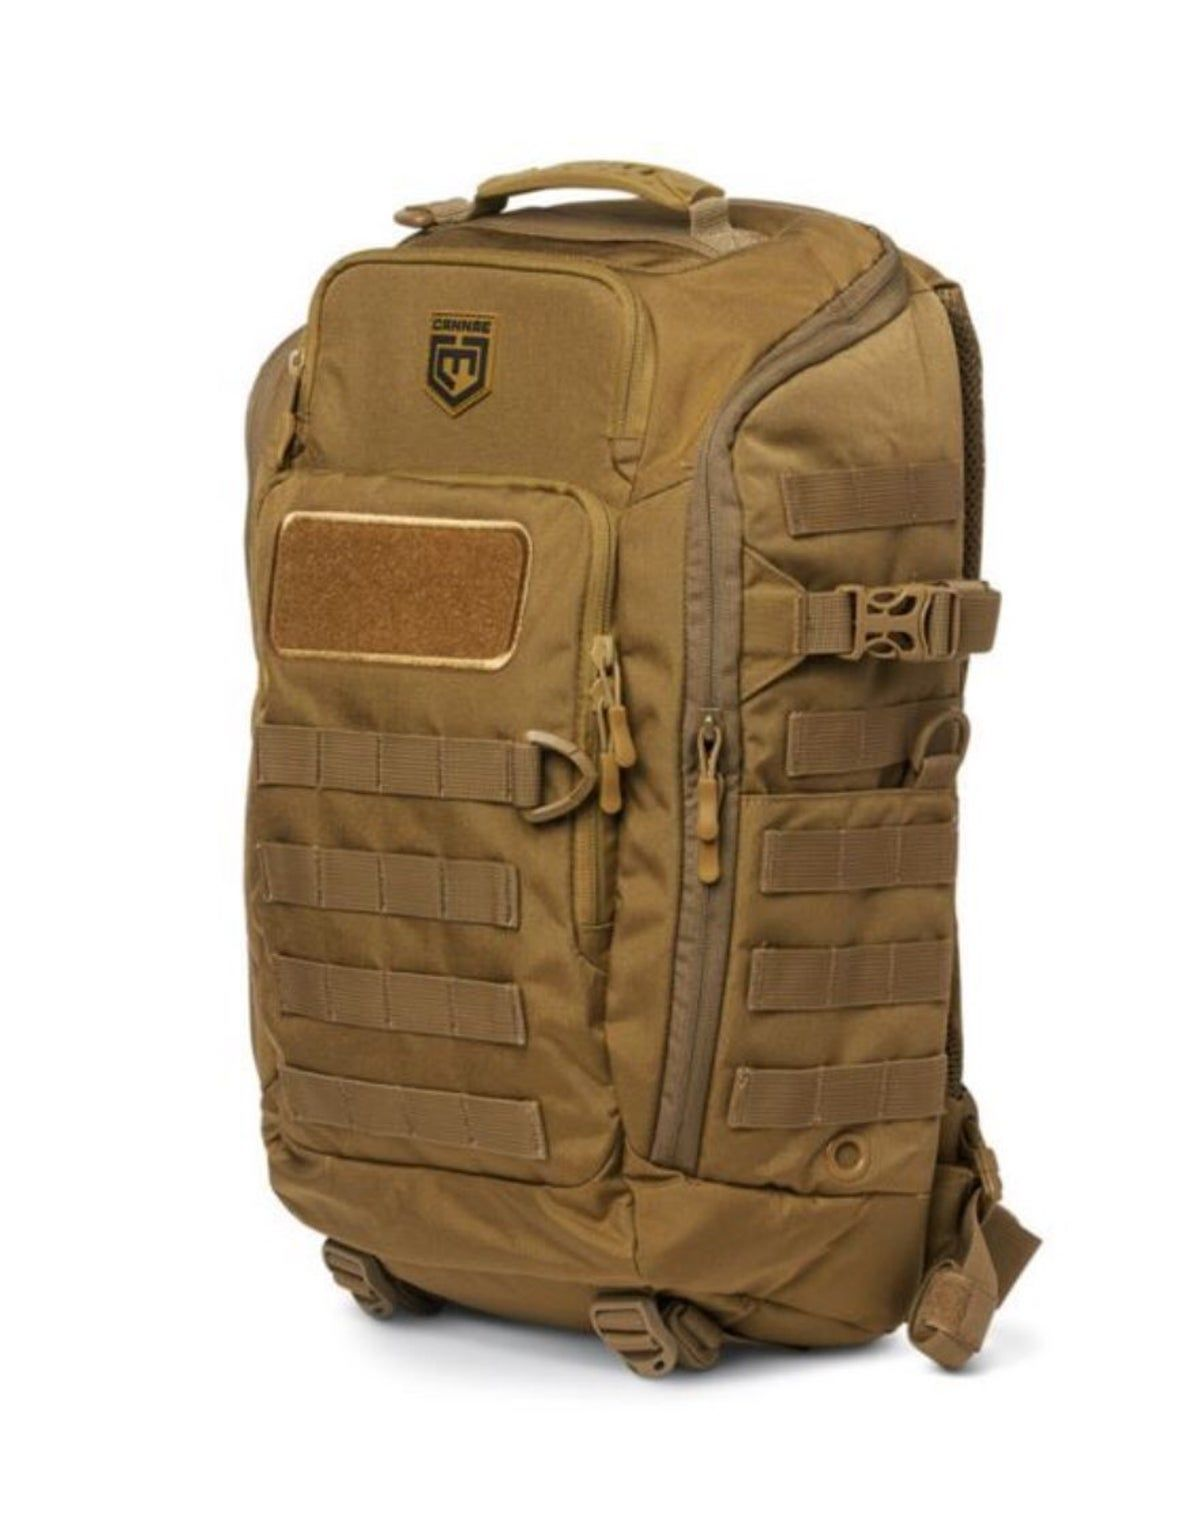 Backpack バッグ と 基本のバッグ アイデア